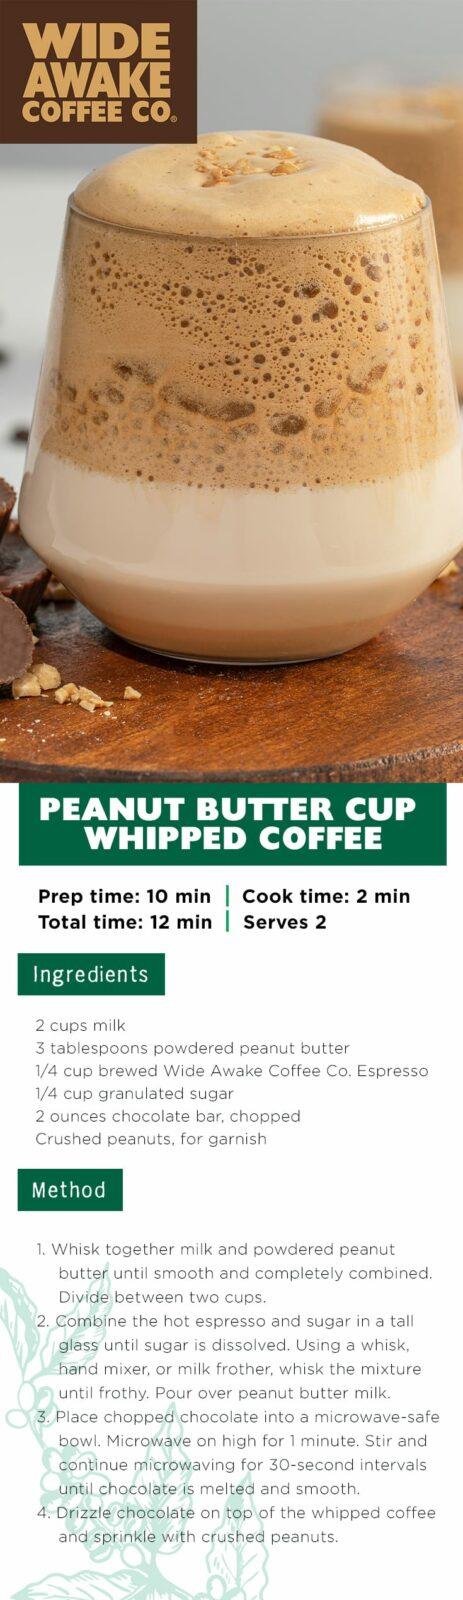 WideAwake_PinterestPinPinterest_Peanut Butter Cup Whipped Coffee